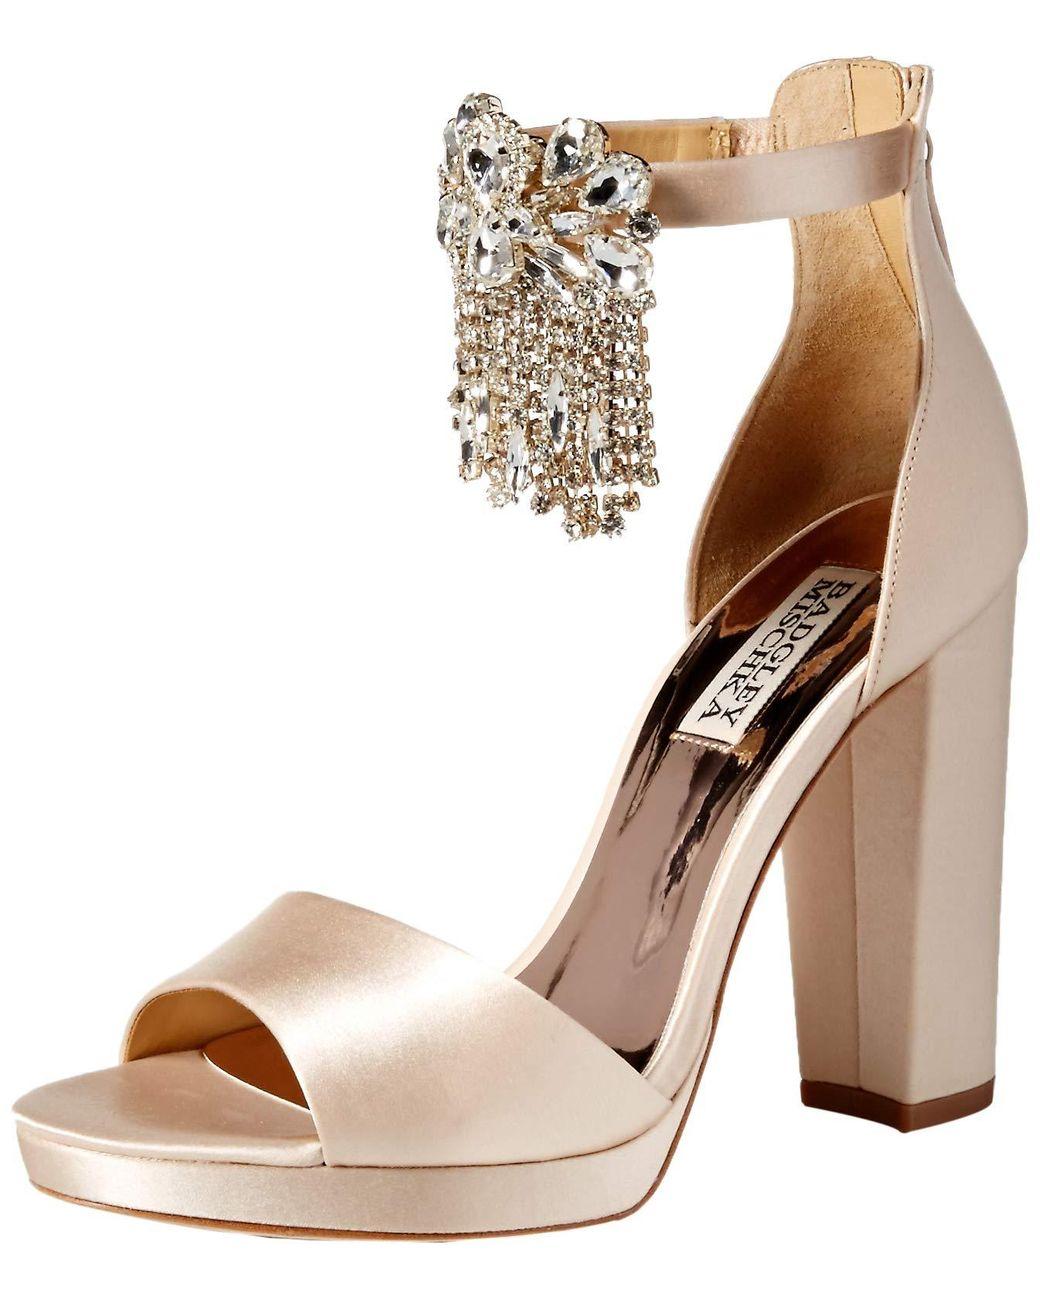 Rebecca Minkoff Christy Leather Block Heel Sandals (475